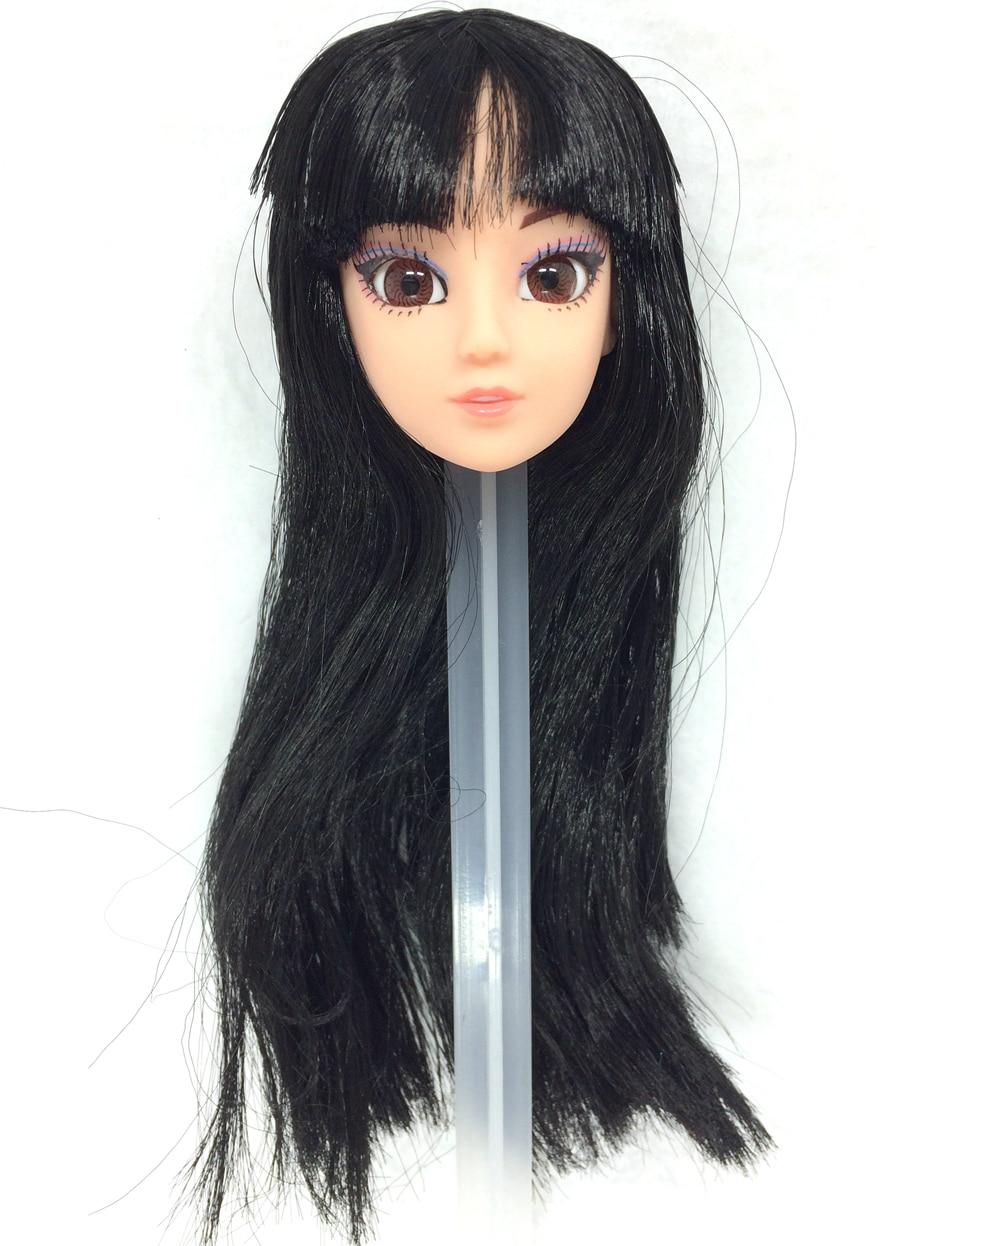 NK One Pcs Vogue Doll Head  Black Hair 3D Eyes DIY Equipment For Barbie Kurhn Doll Greatest Woman' Reward Little one' DIY Toys 024T